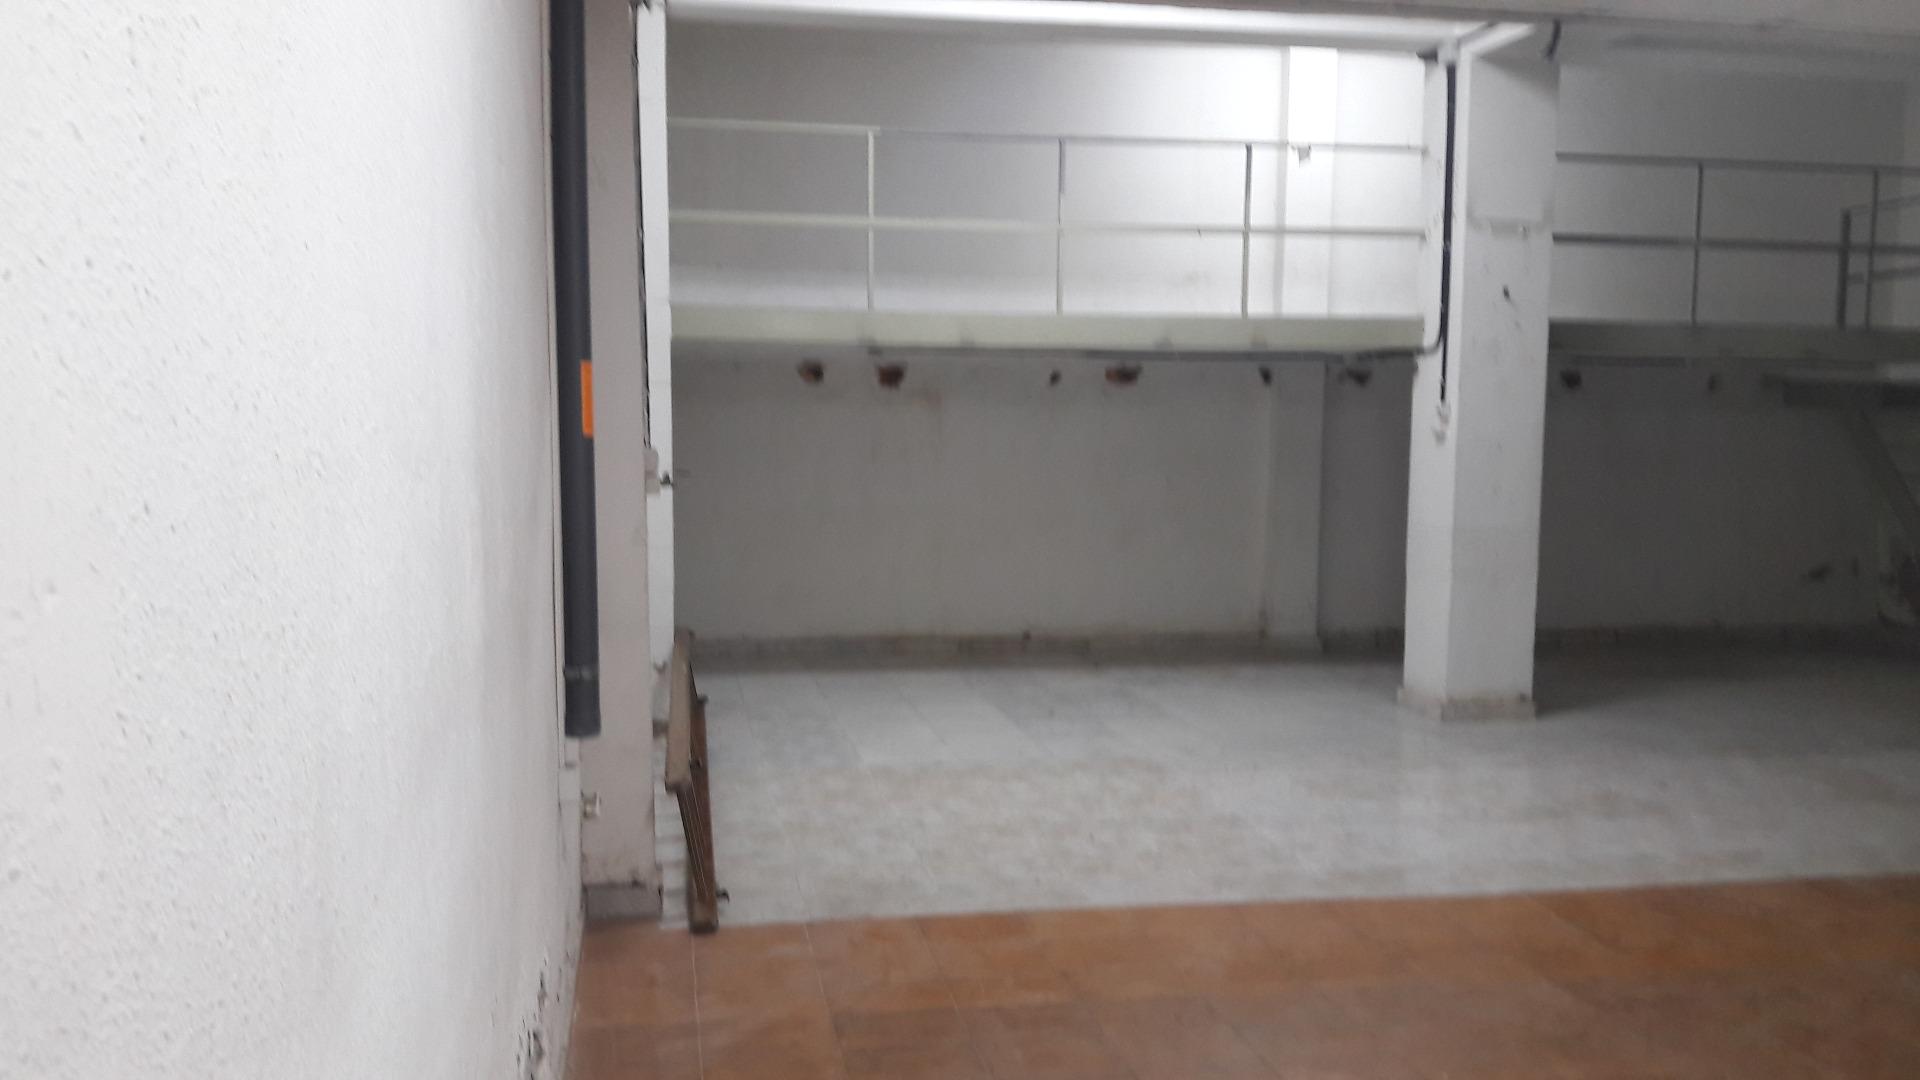 Alquiler Edificio  Zona pl. payeses de 435 m² diáfana. Casa de fábrica ideal para loft o uso industrial de 435 m² en zo